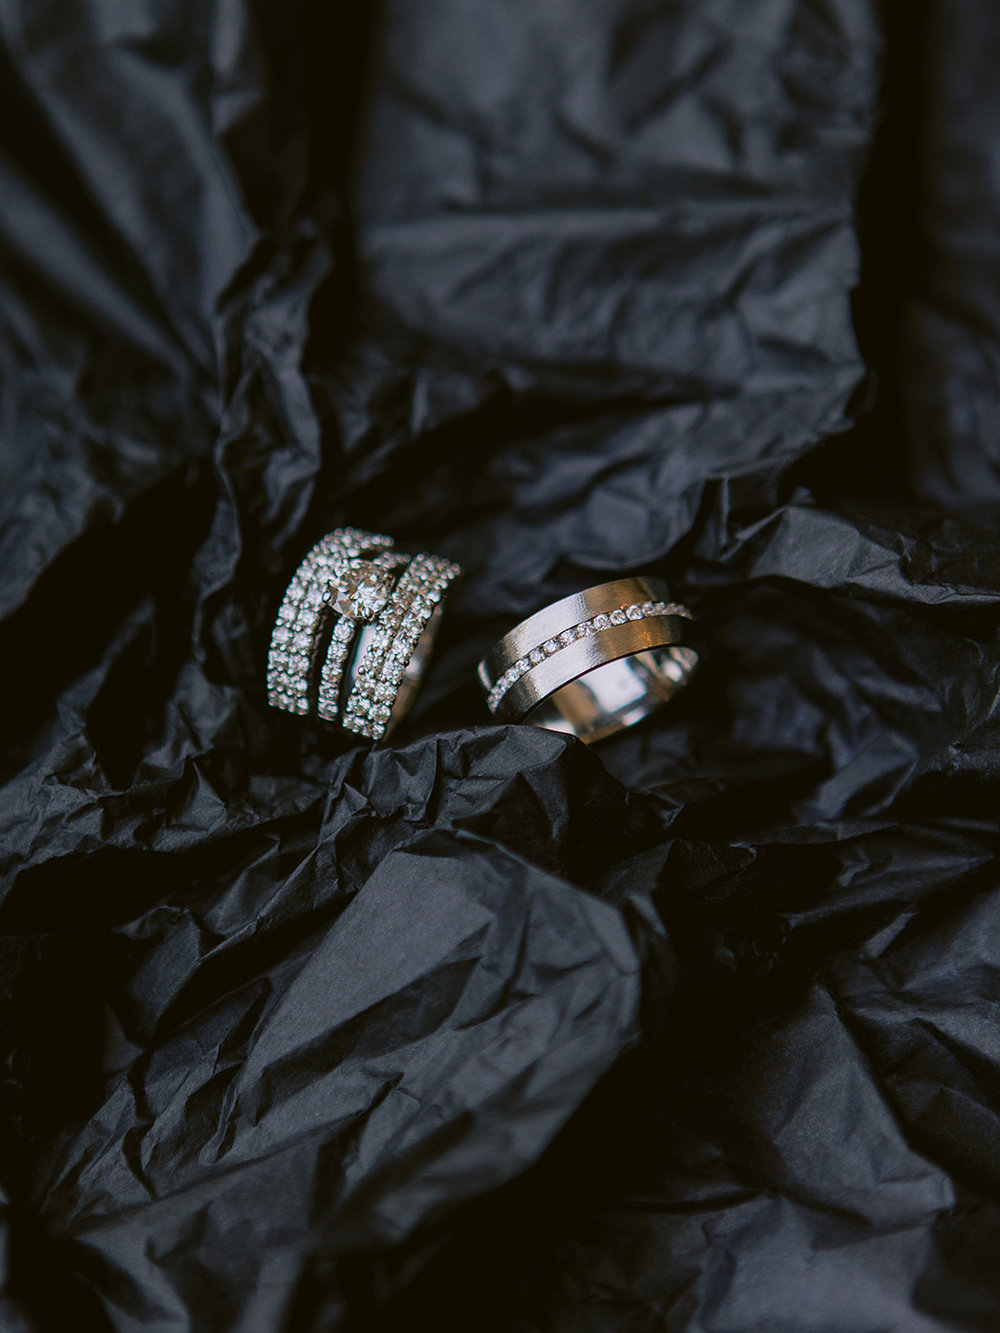 Rings | Rensche Mari Photography